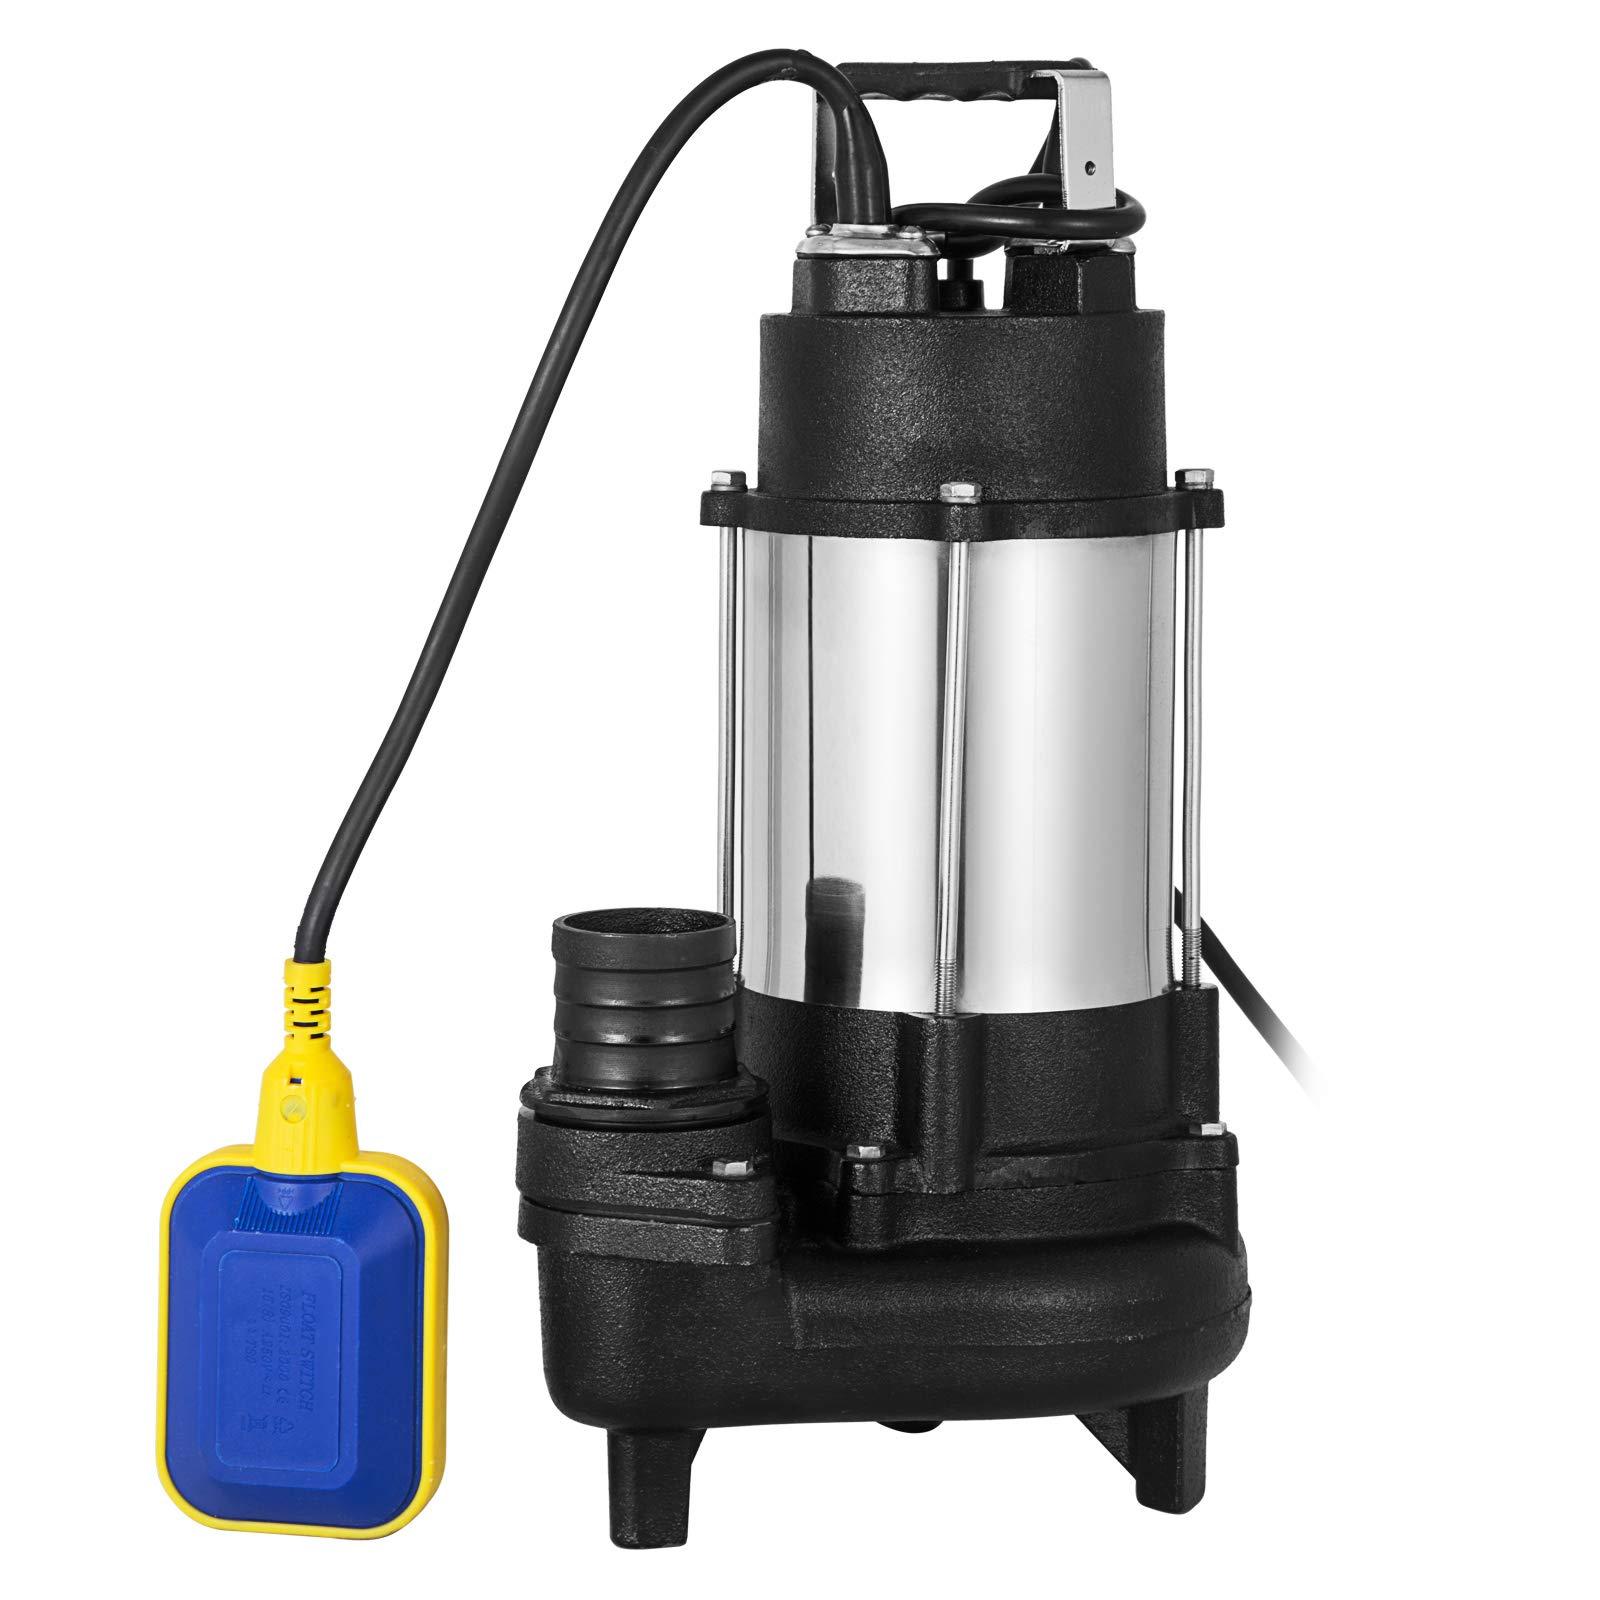 Vinbero 110V 3/4HP Sewage Pump 304SS 46FT Max Head Lift 5600GPH Max Flow Pump With 20FT Cable & Plug Heavy Duty Cast steel Sewage Pump by Vinbero